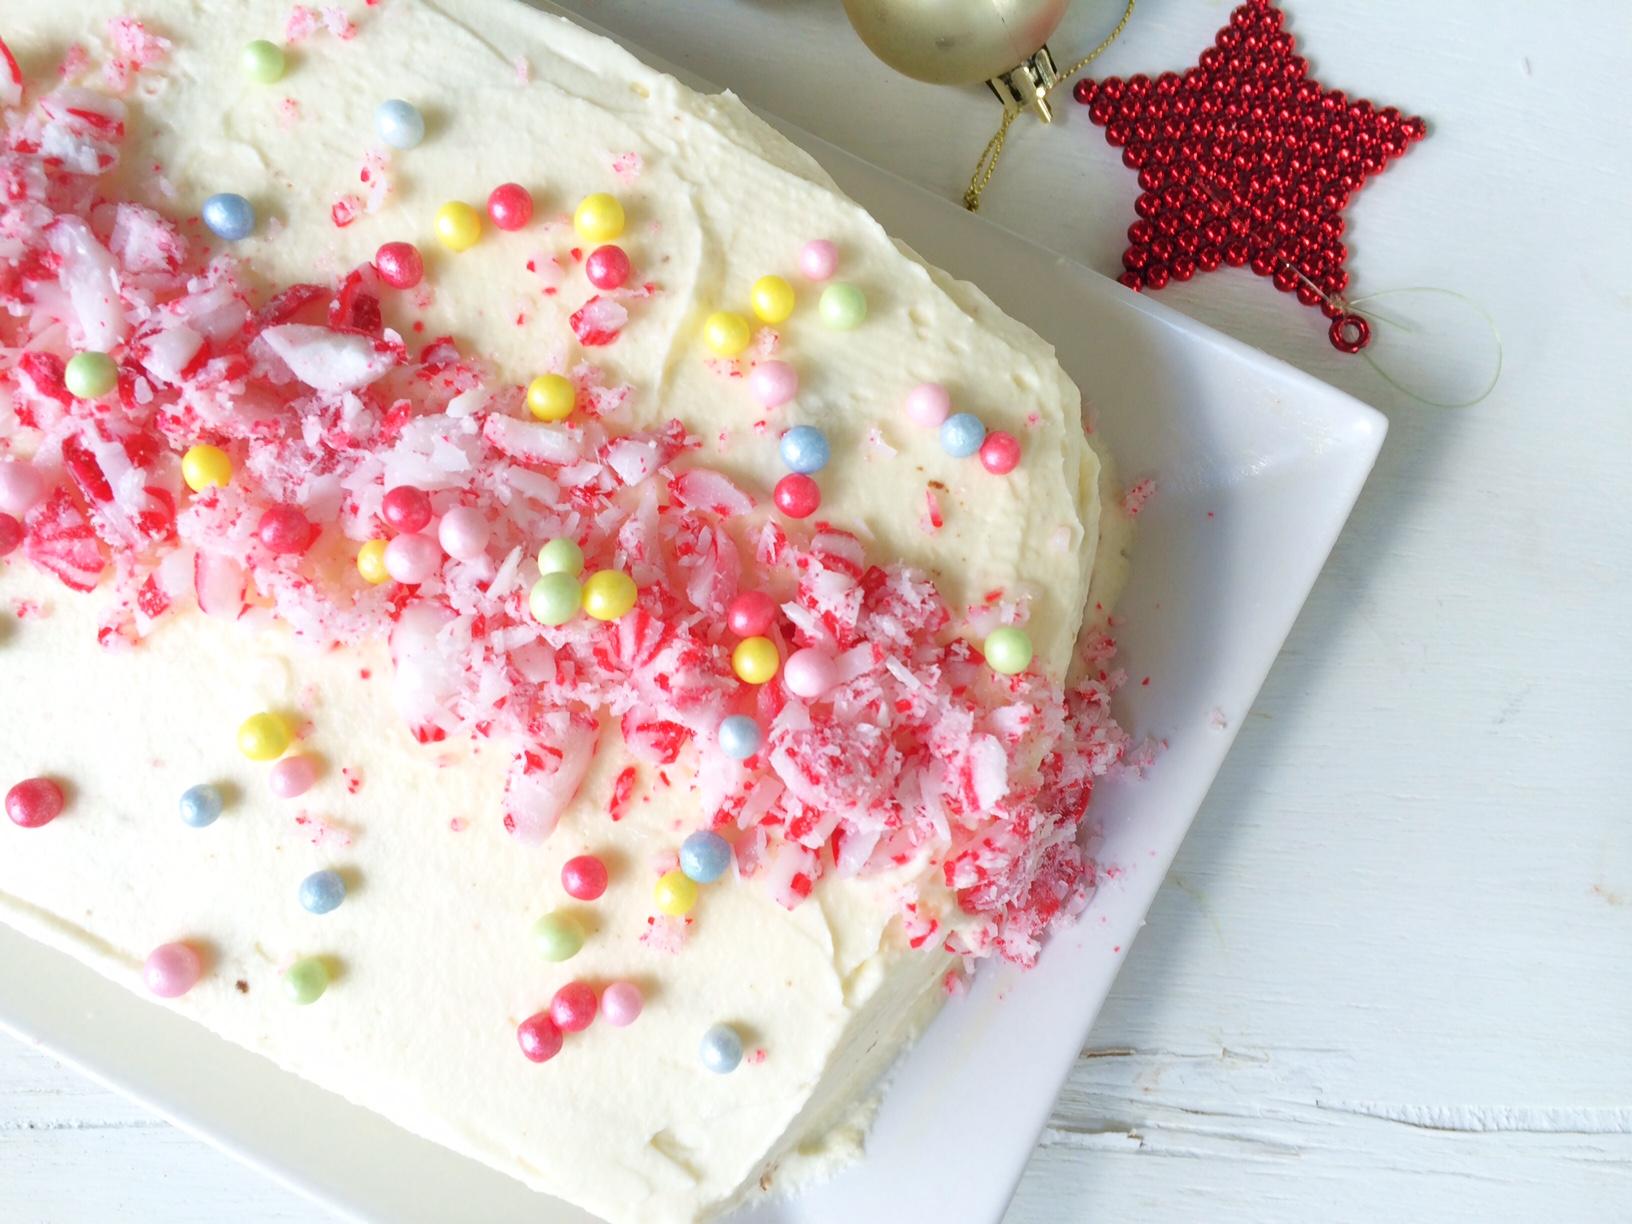 Minty Chocolate Ripple Cake